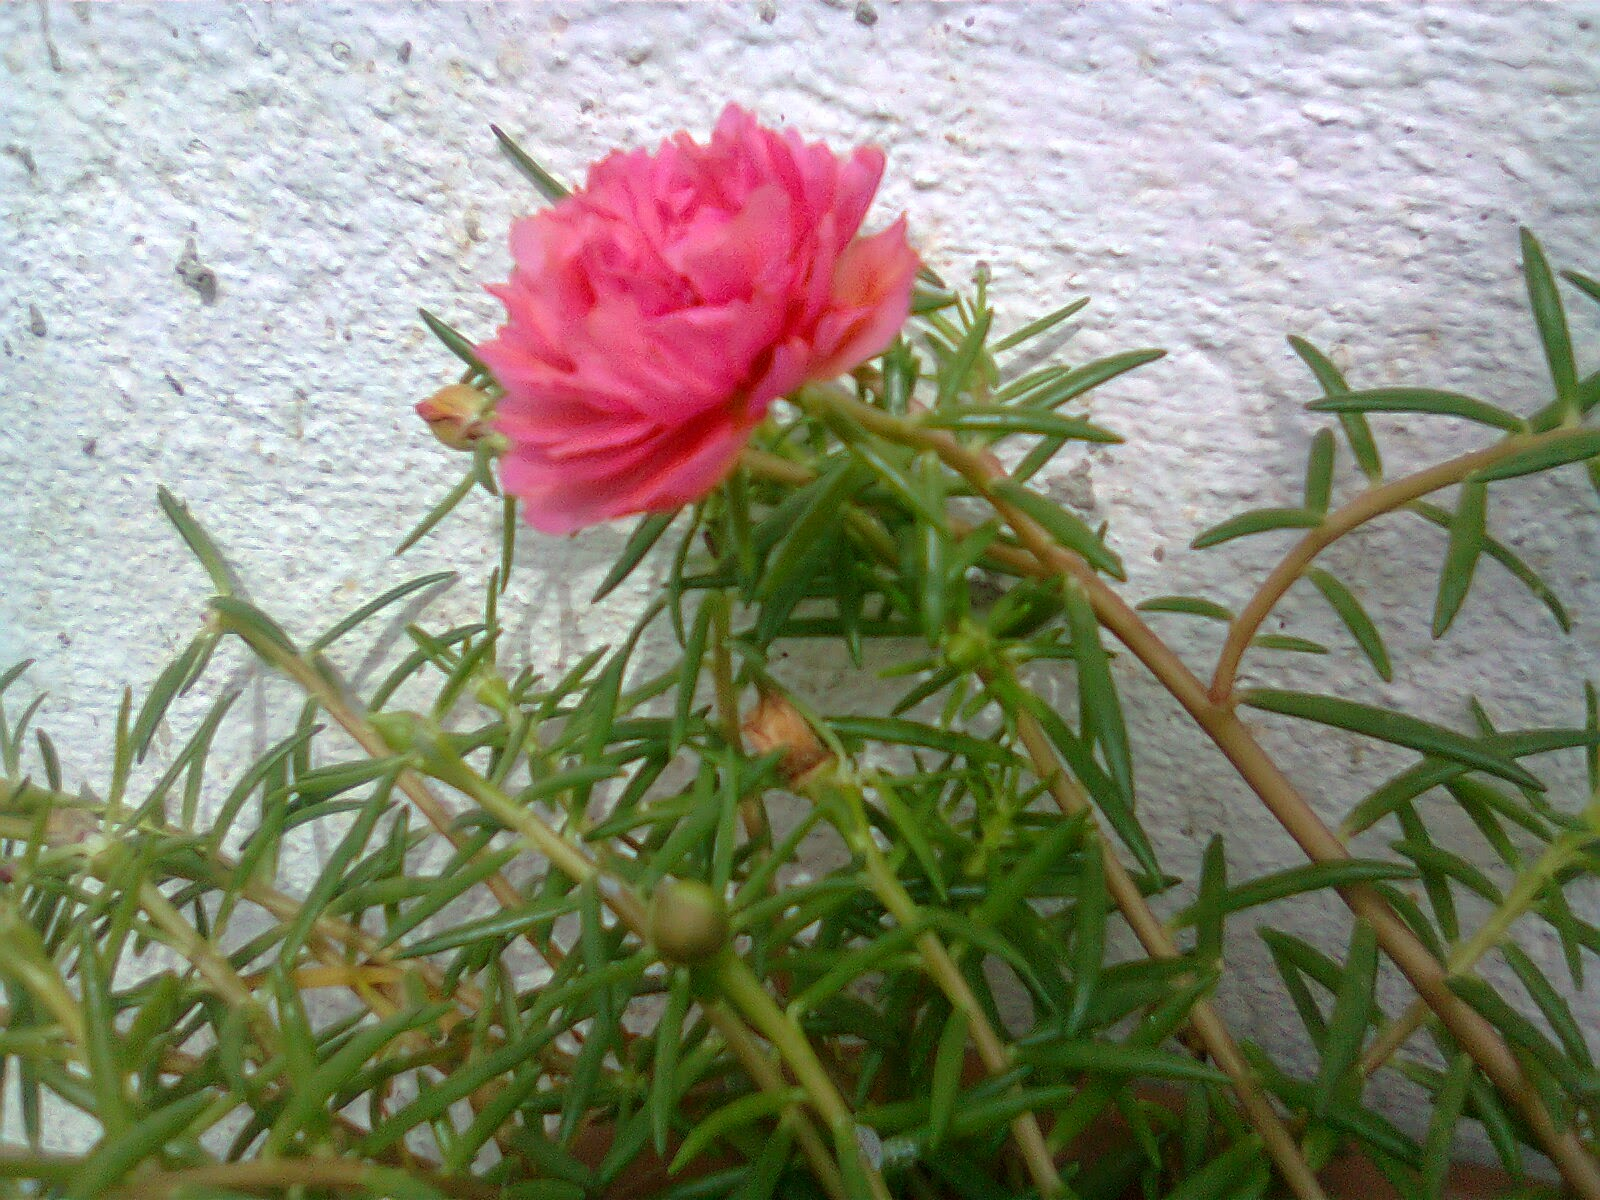 ros jepun